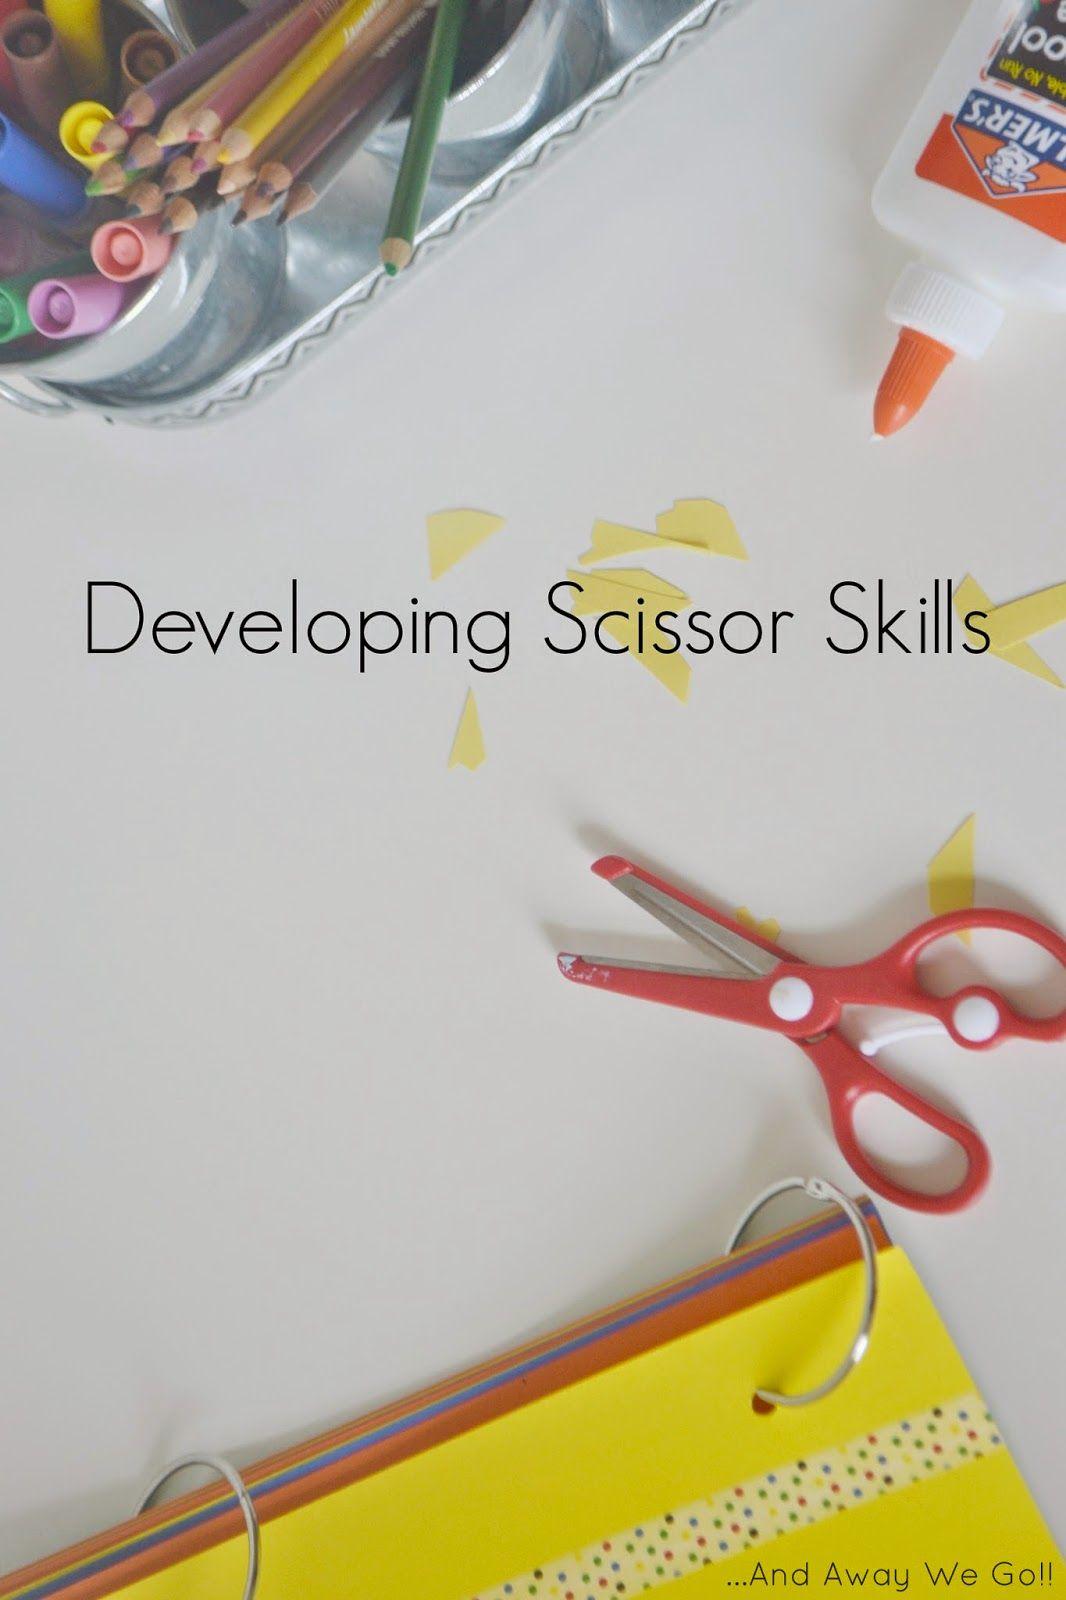 Developing Scissor Skills